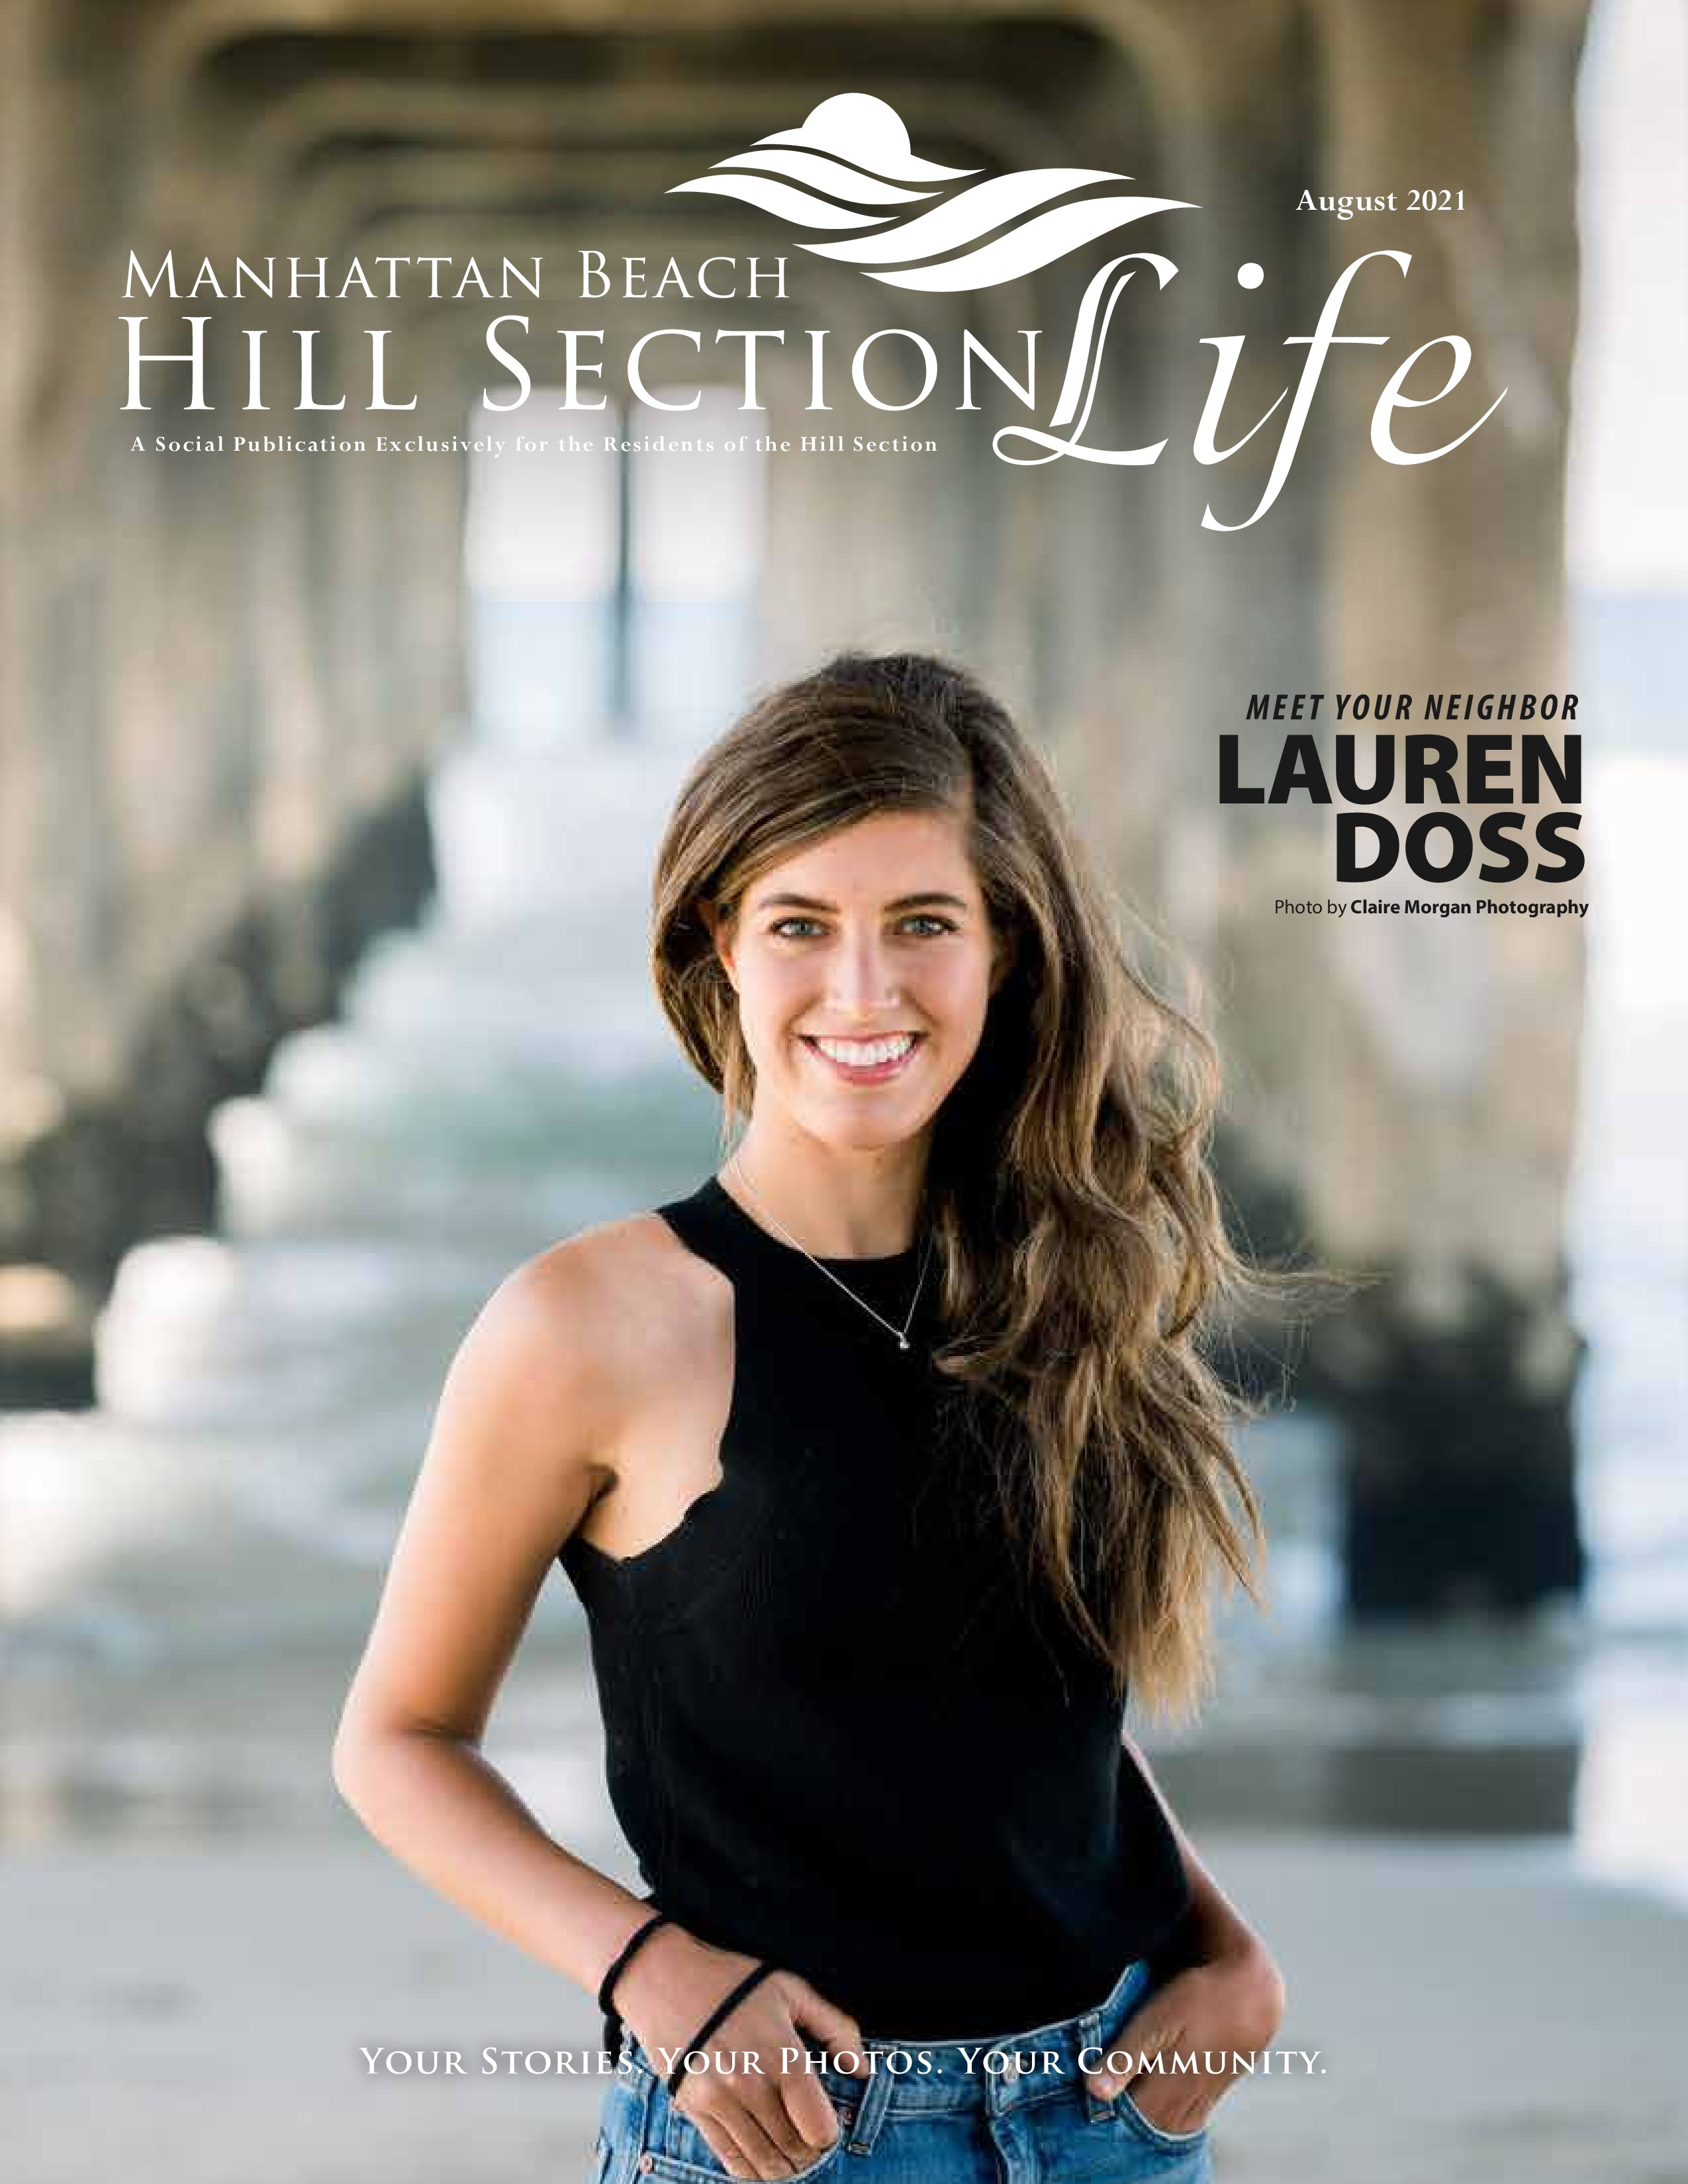 Manhattan Beach Hill Section Life 2021-08-01